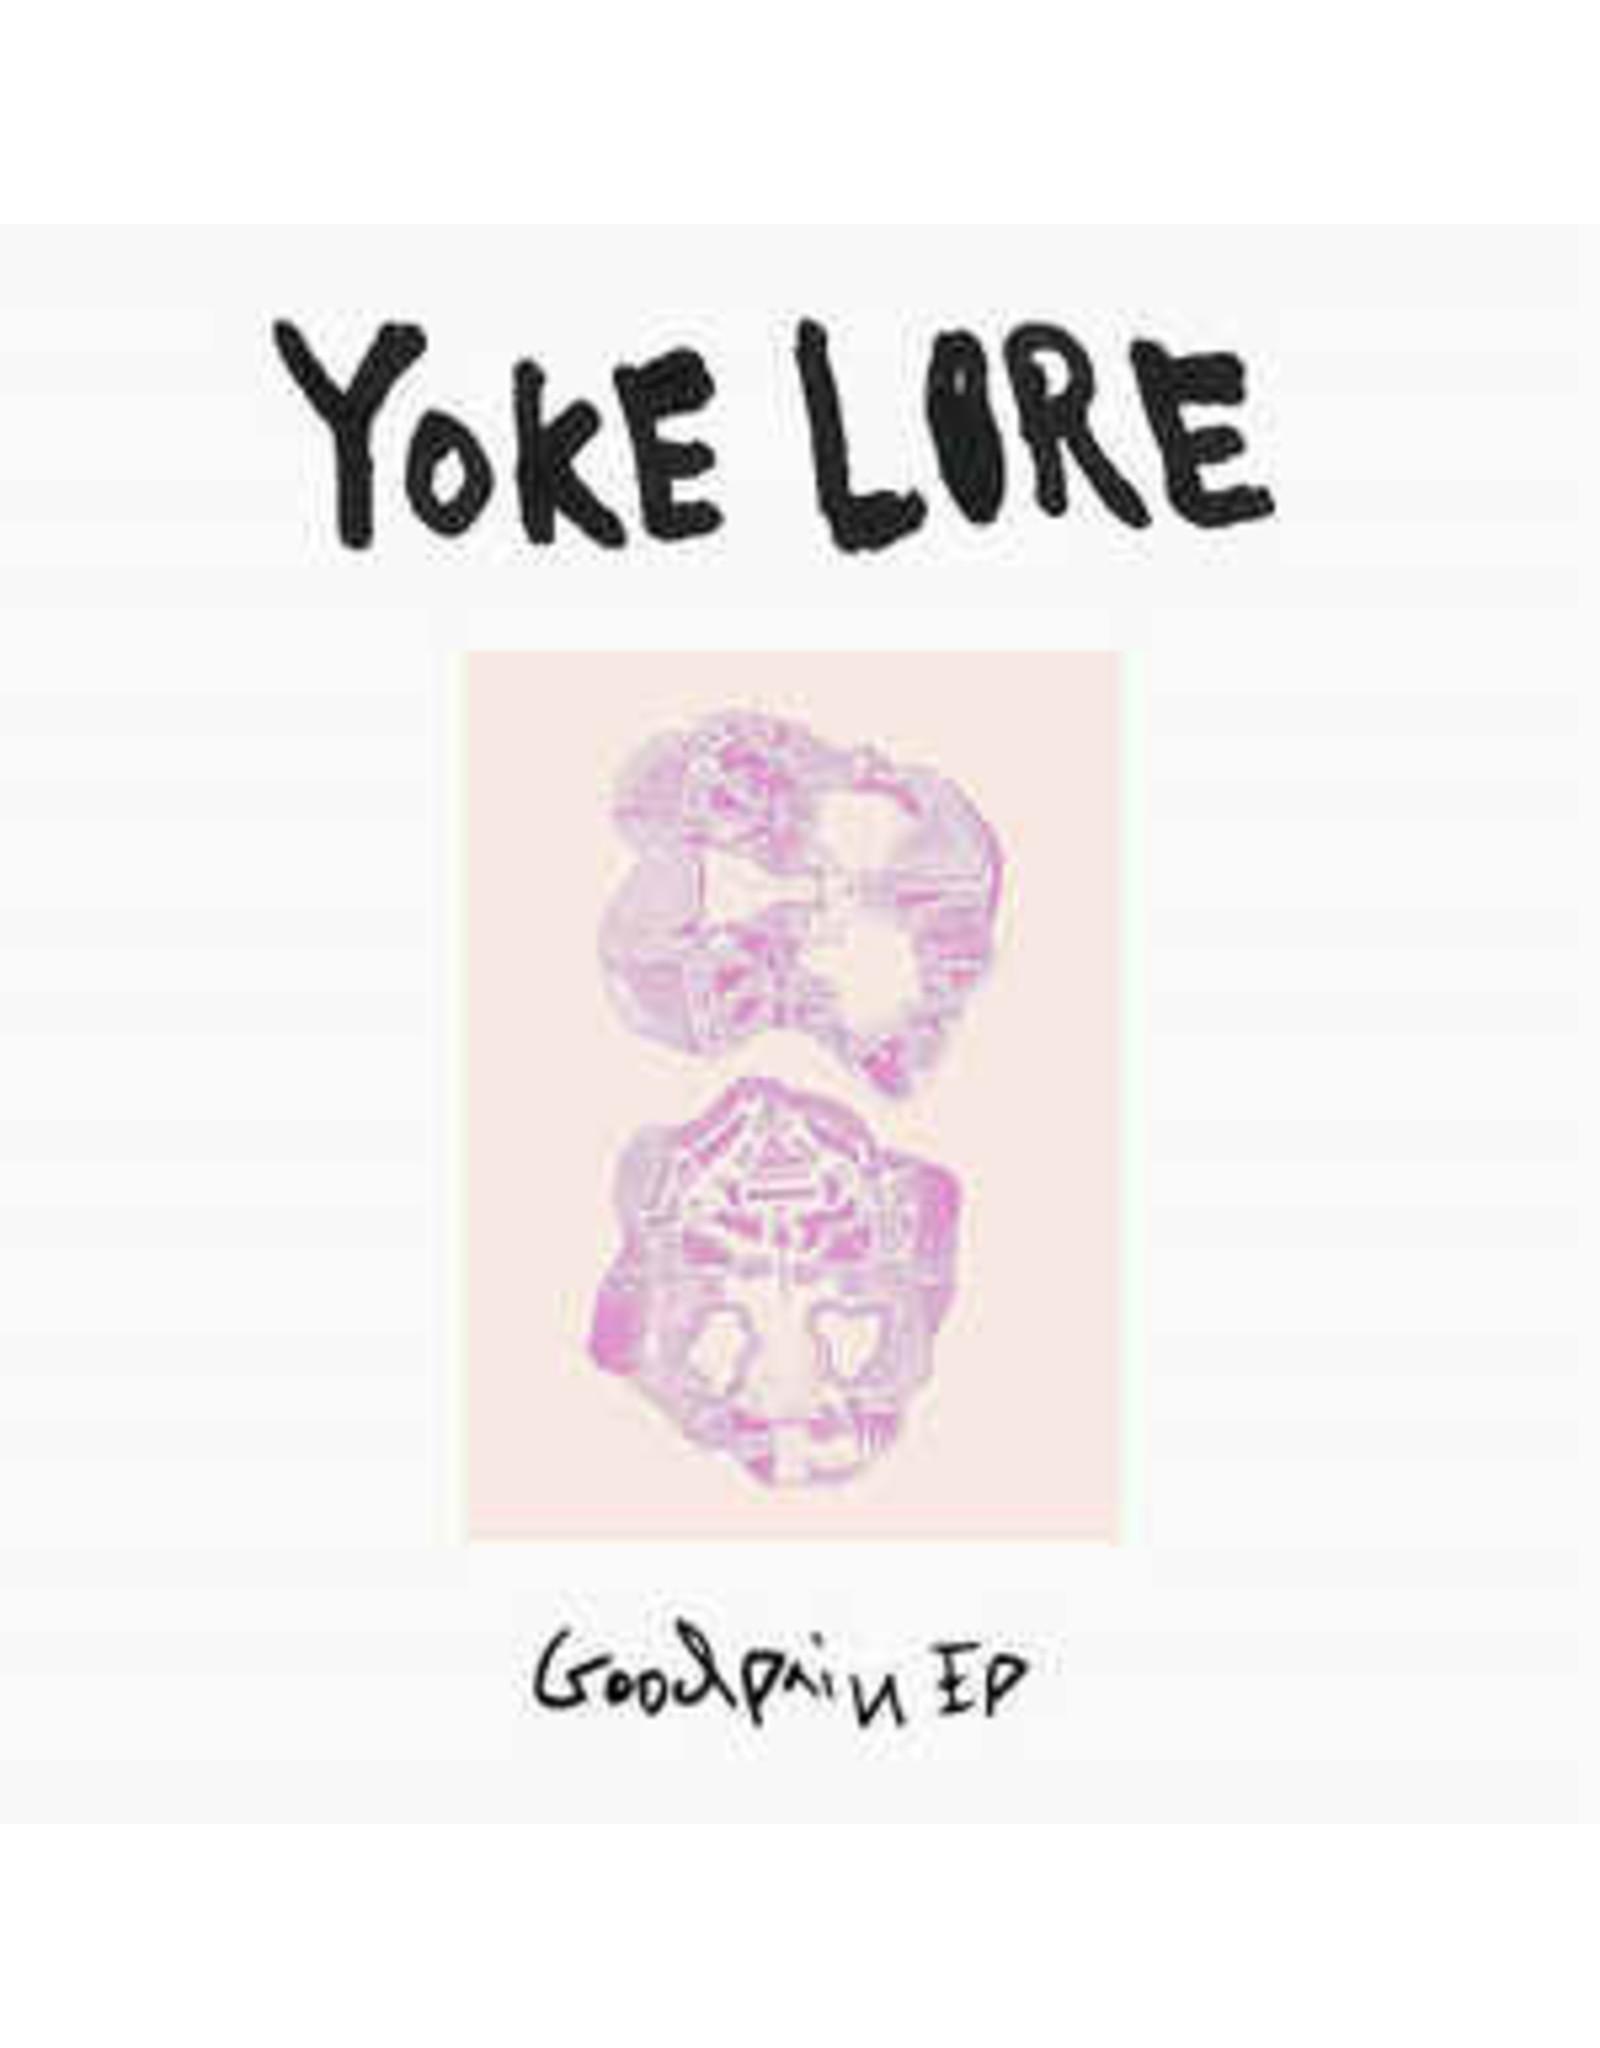 Yoke Lore - Good Pain EP LP